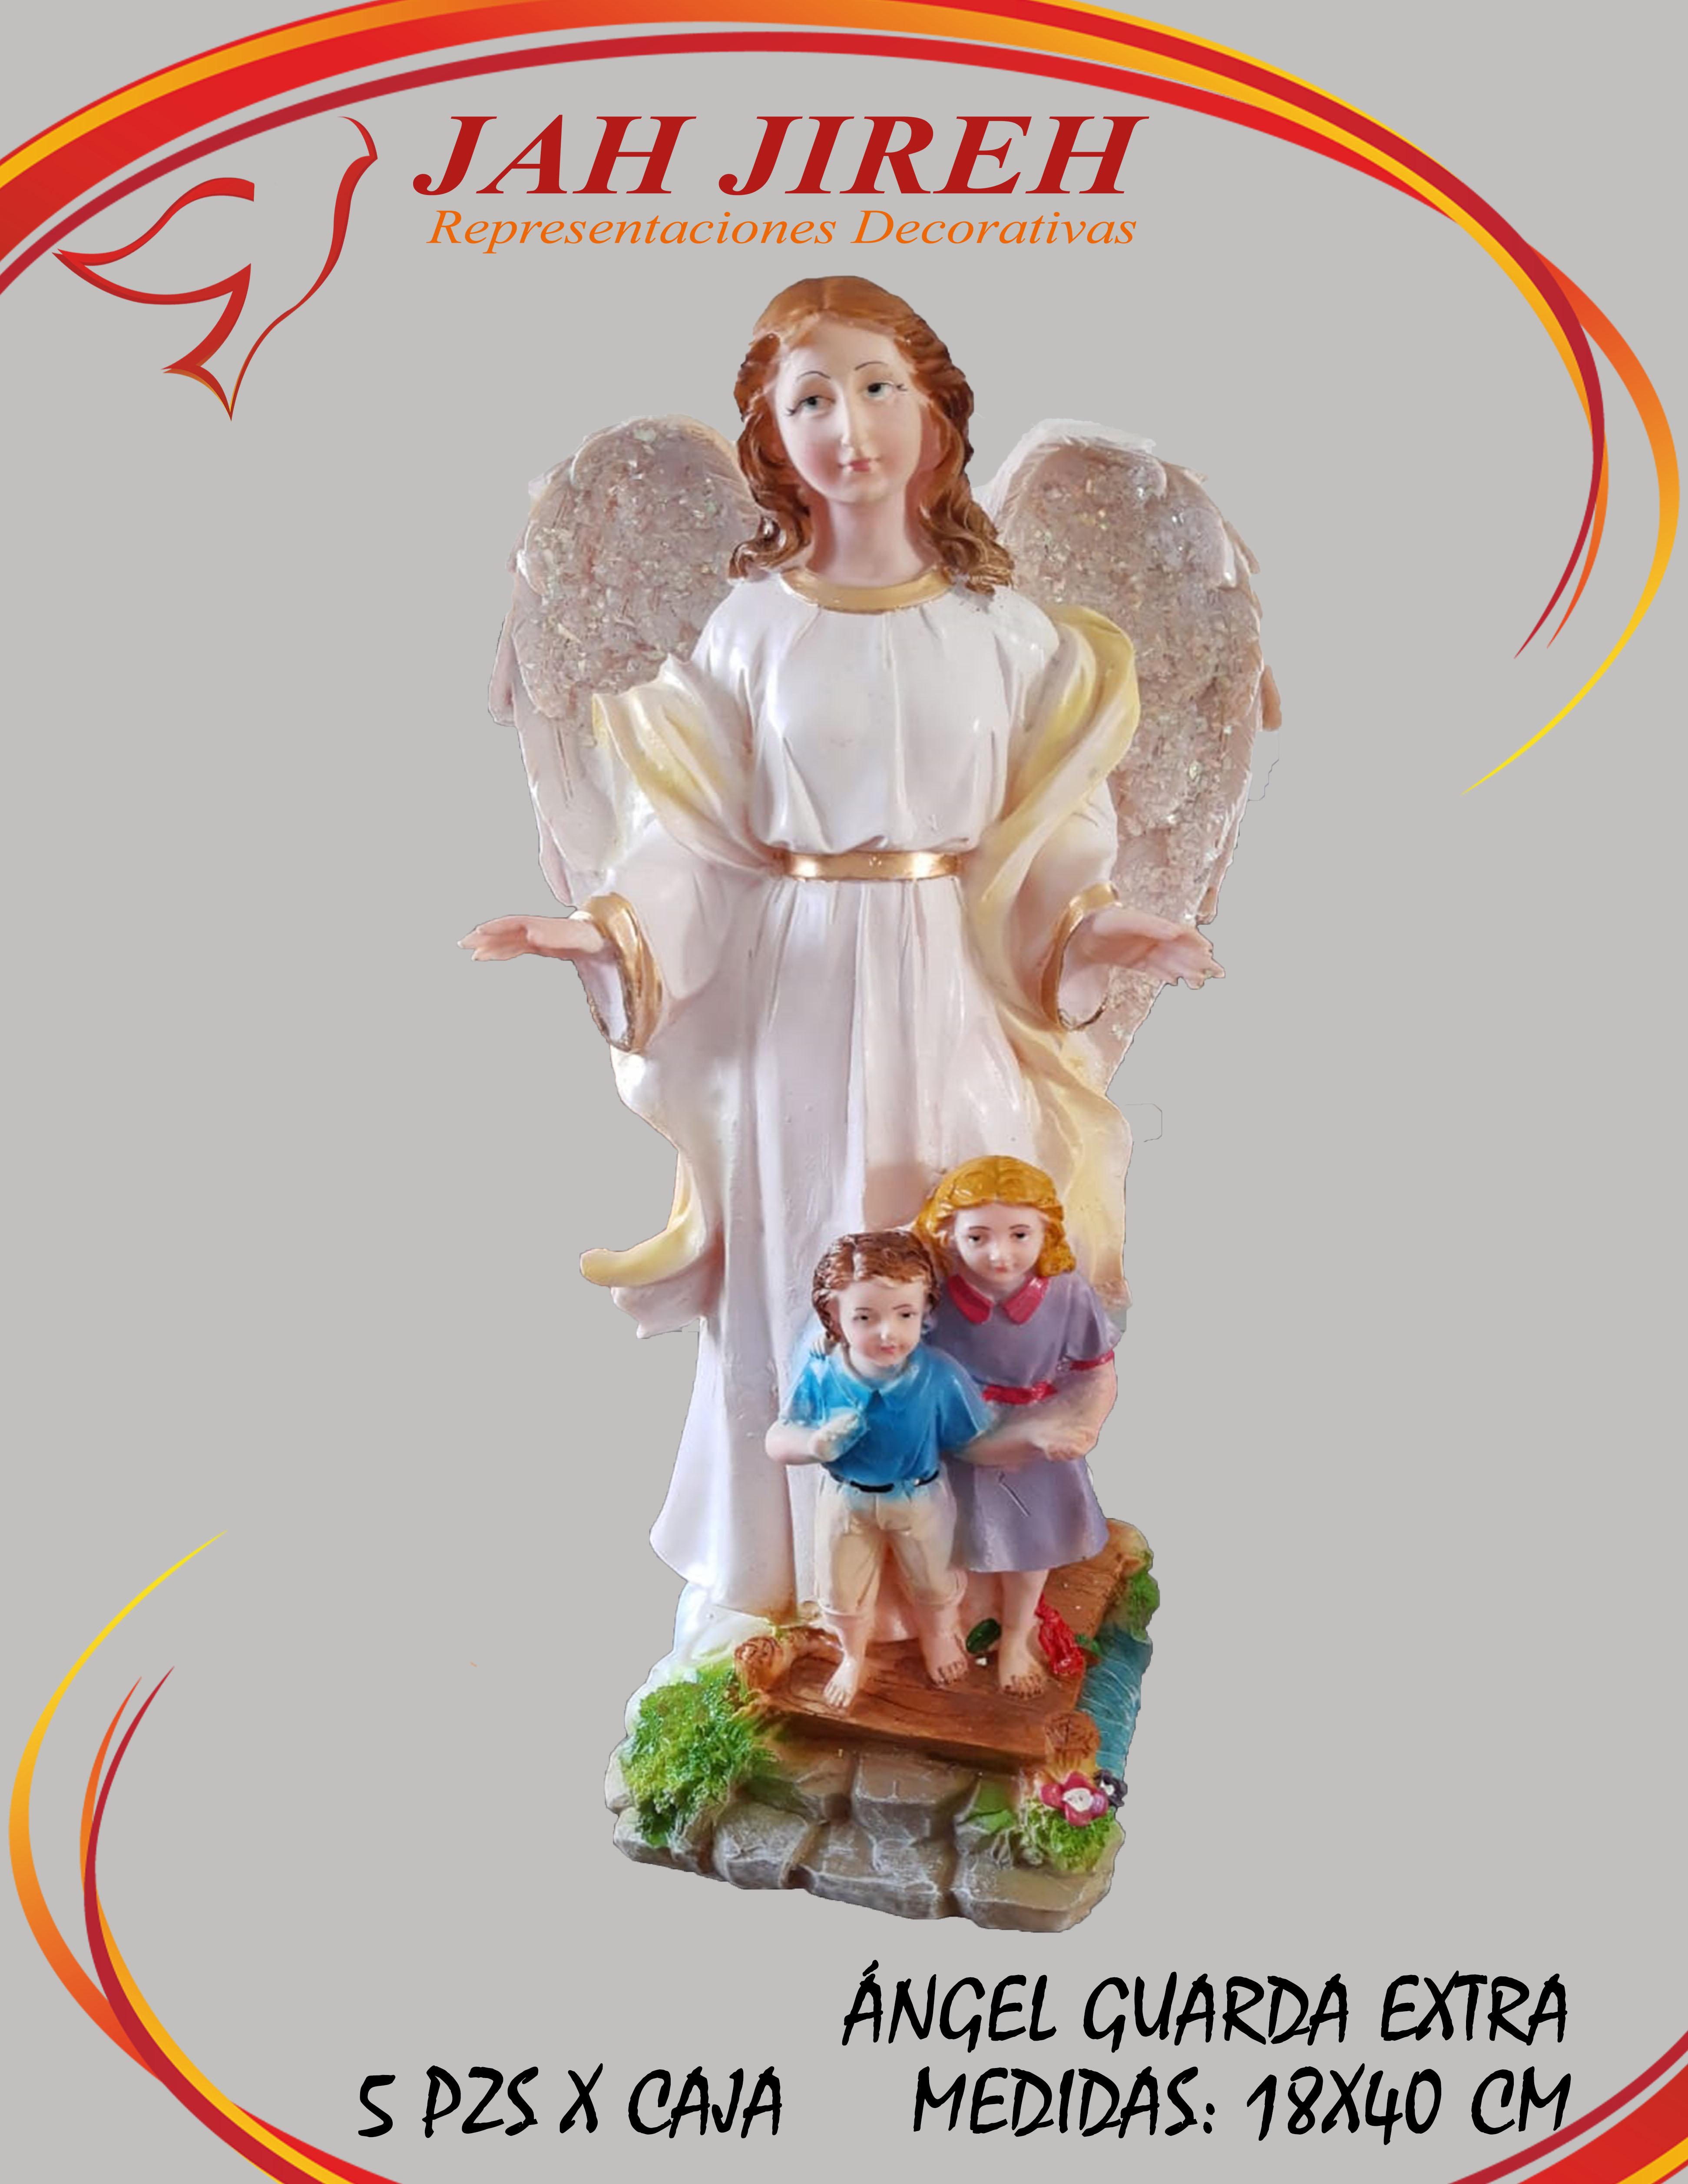 https://0201.nccdn.net/1_2/000/000/0bc/3e5/angel-guarda-extra.jpg